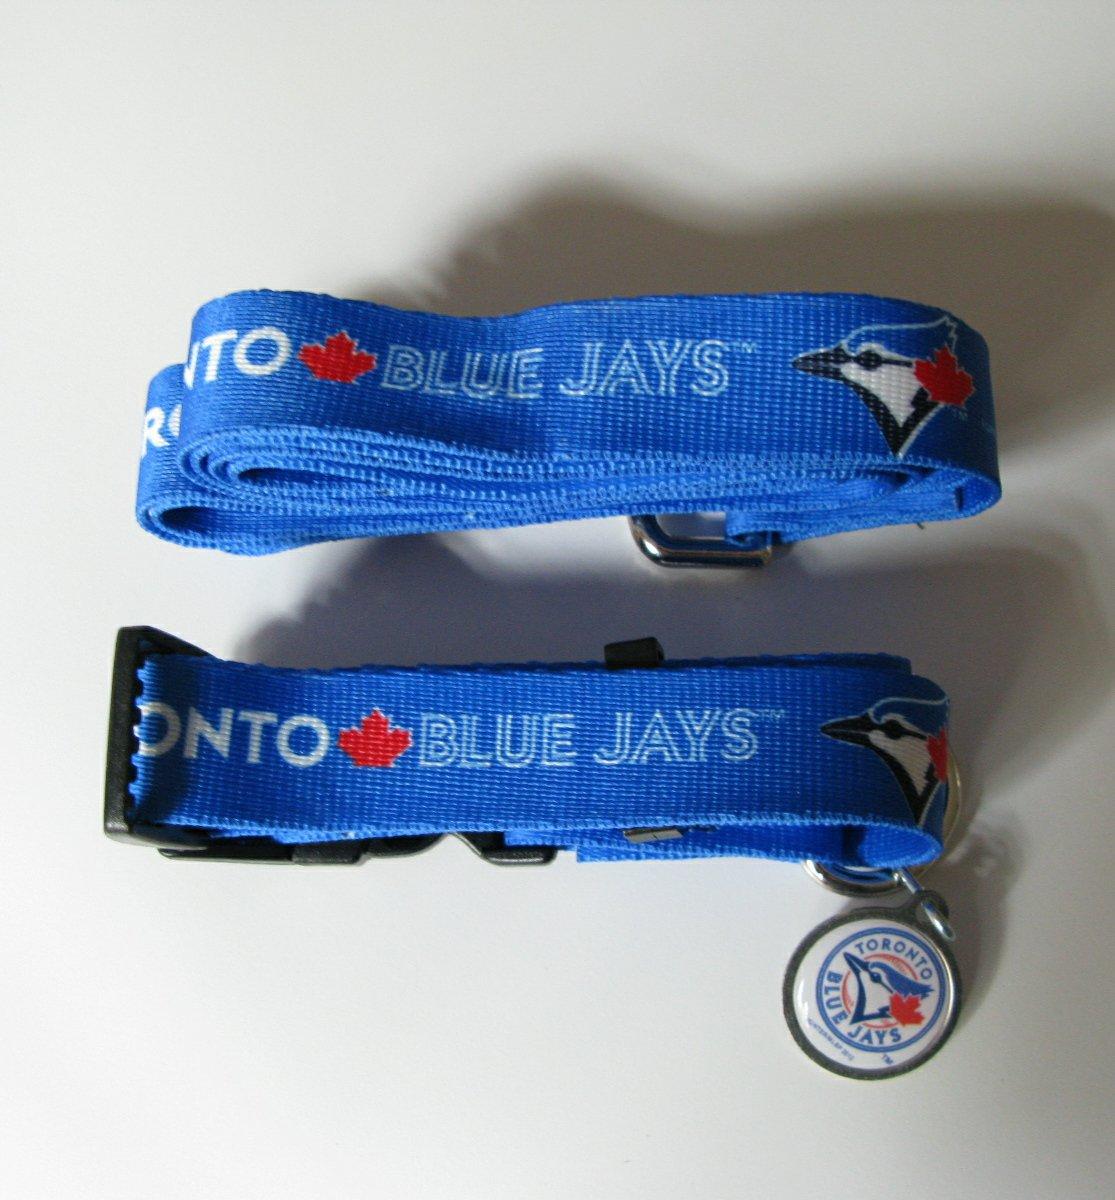 Toronto Blue Jays Pet Dog Leash Set Collar ID Tag Small